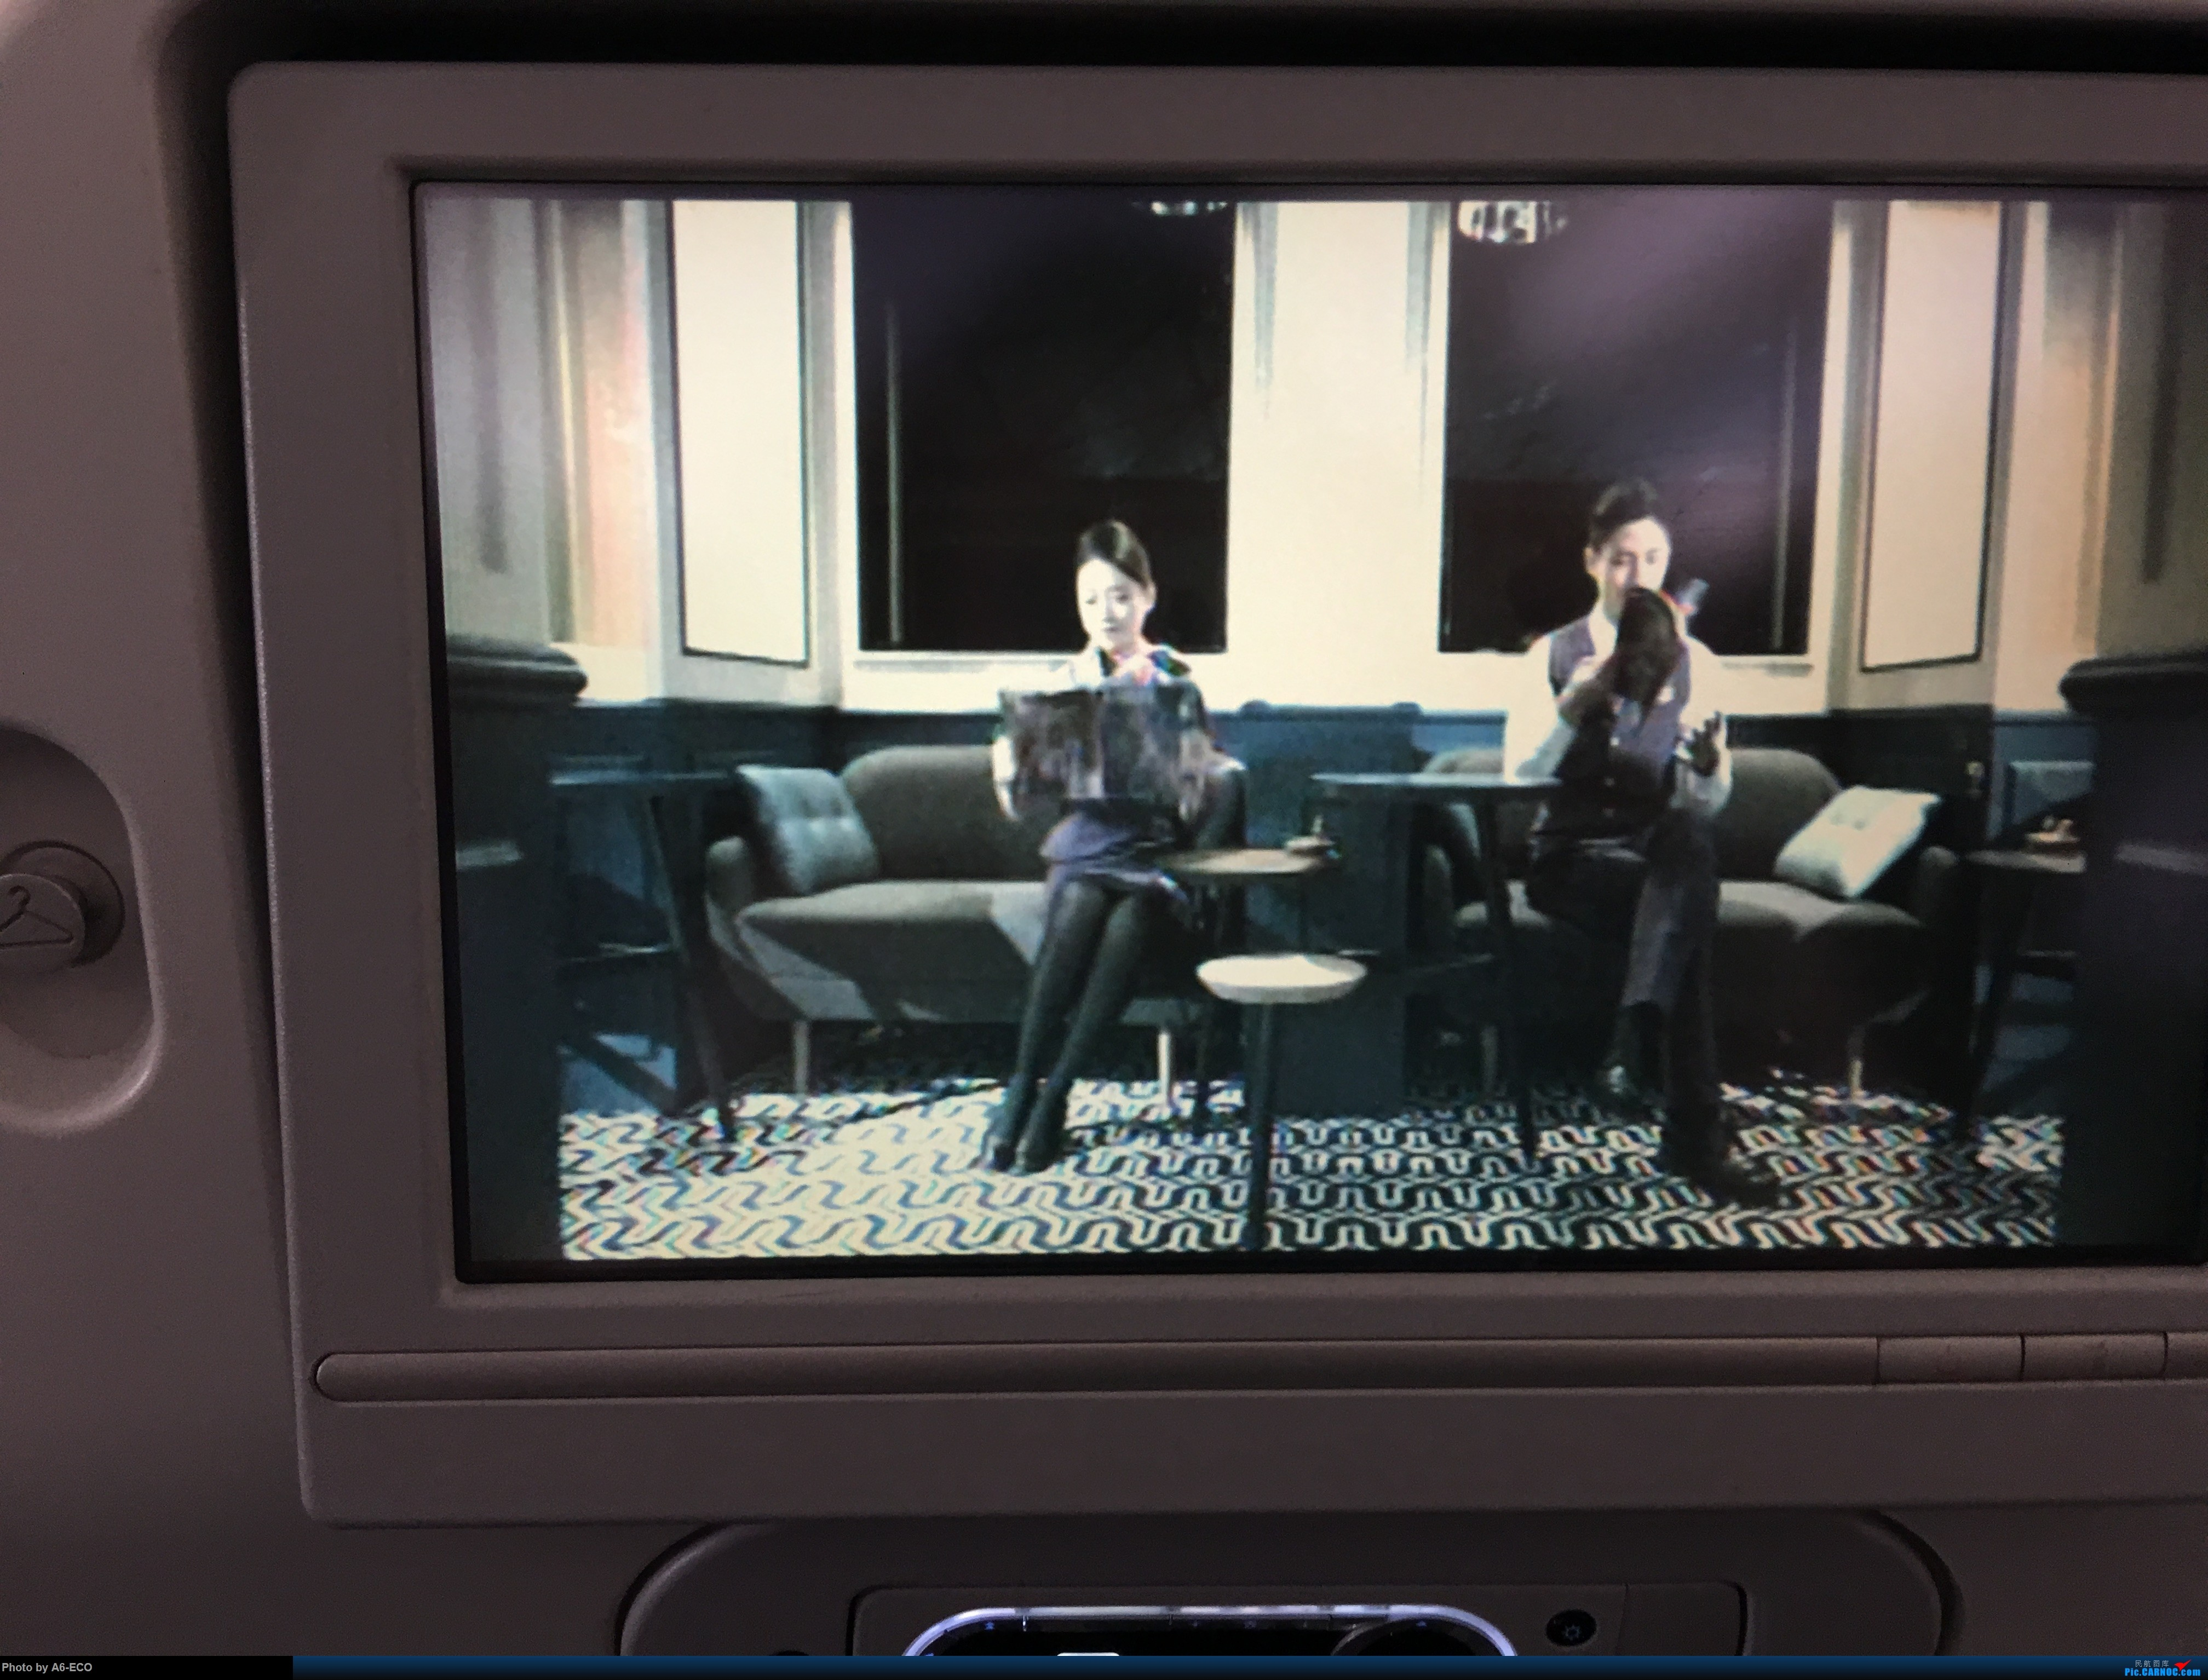 Re:海鲜航305航班+hxg拍机+香港推荐美食+回程海鲜航 AIRBUS A330-300 B-LNP 中国北京首都国际机场